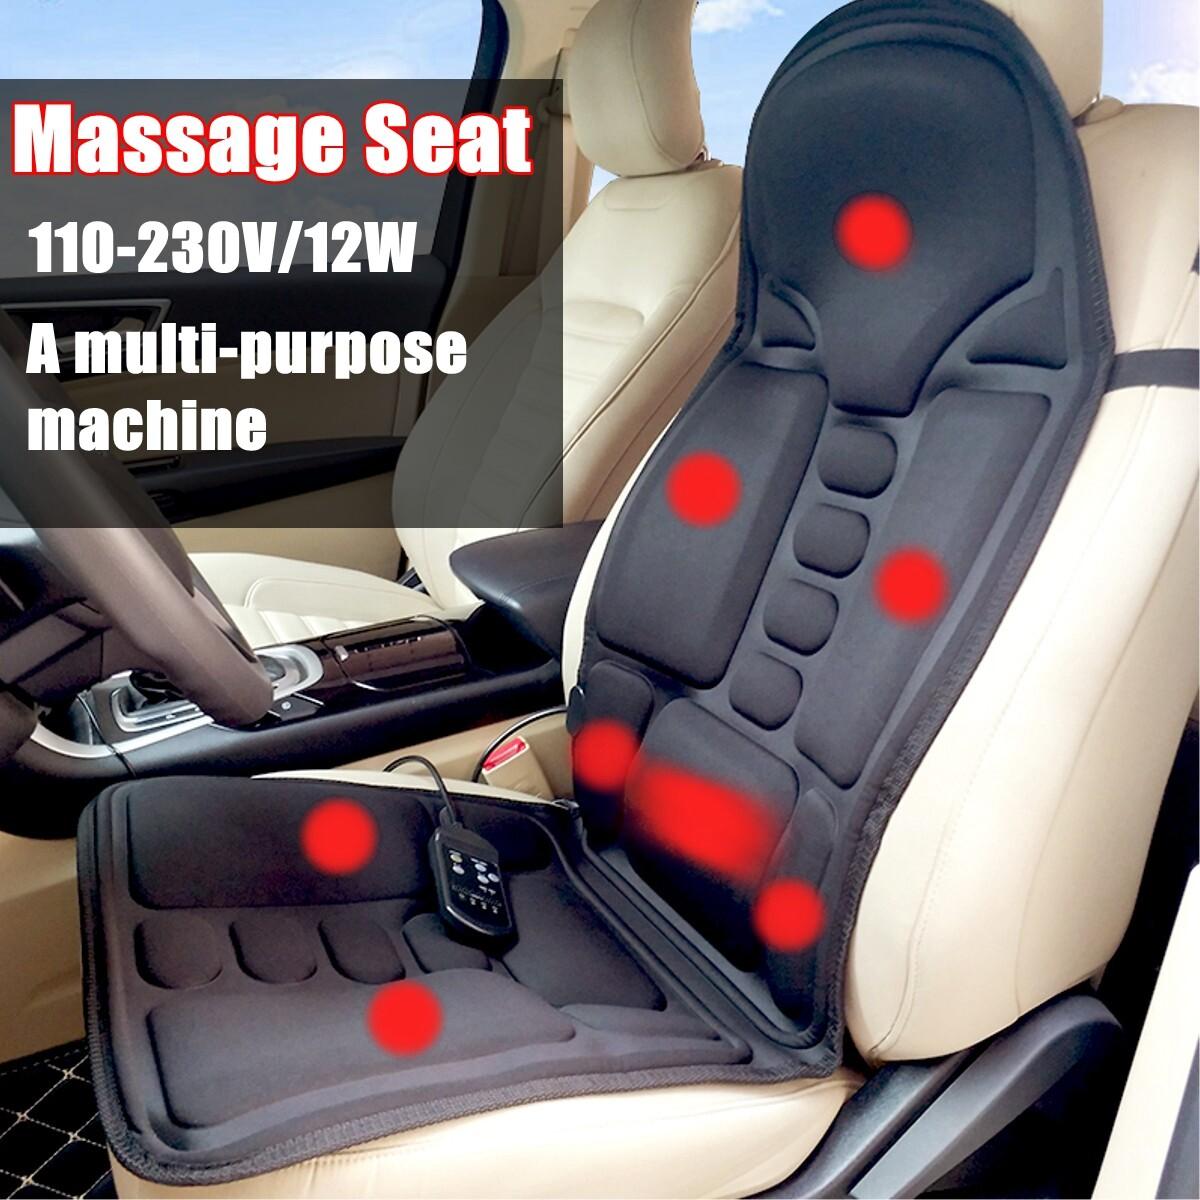 220V Portable Controllable Full Back Massager Cushion 3-Gear 8-Massage Mode Adjustable For Home Office & Travel Back Neck Shoulder Relaxation